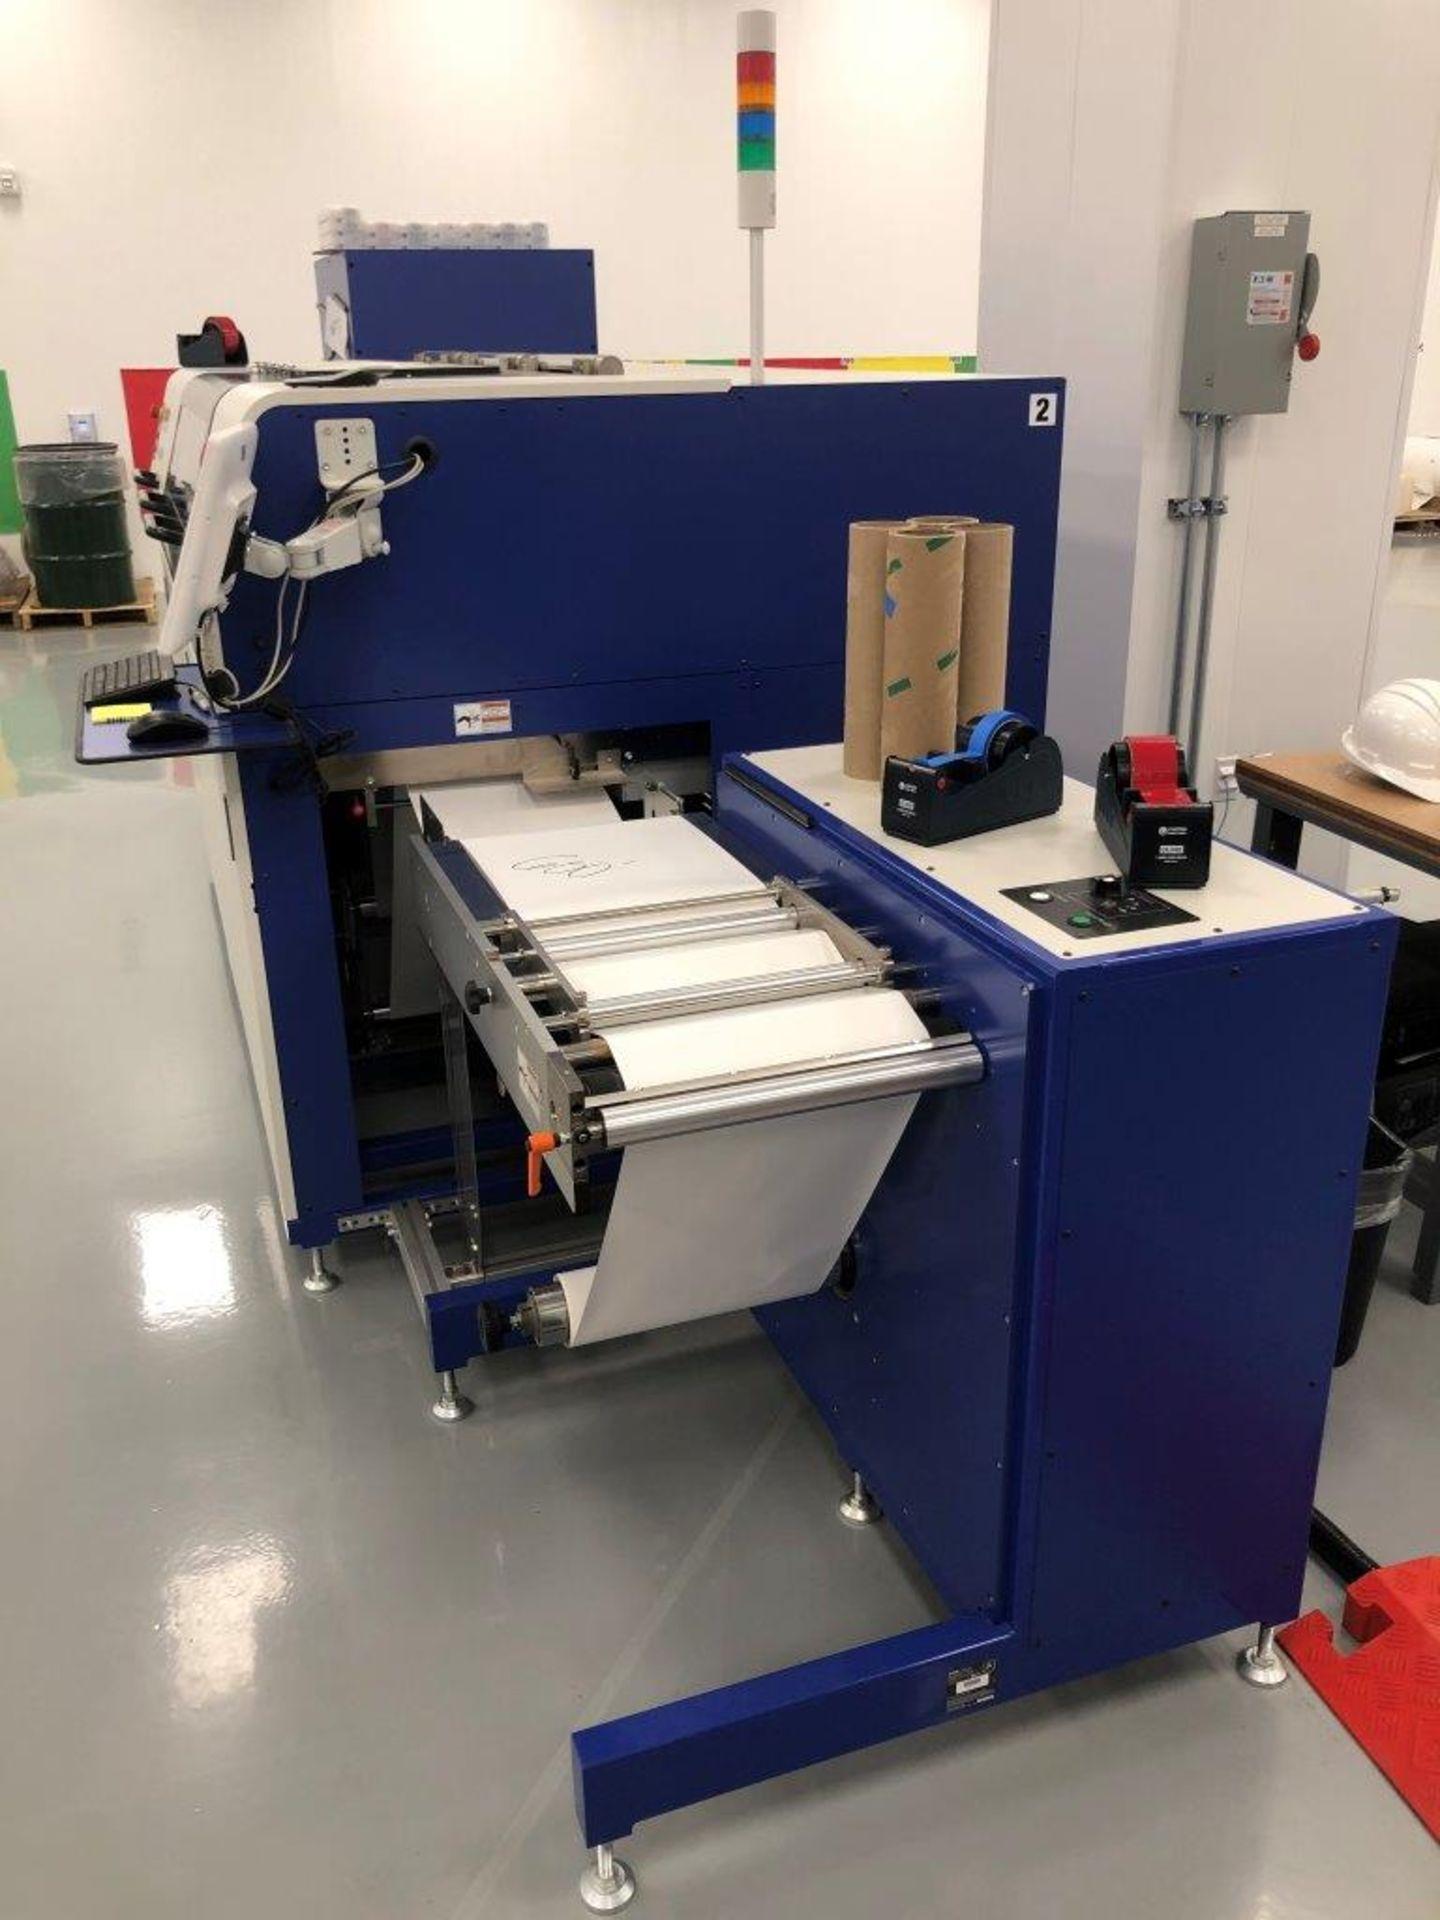 Lot 4 - Epson SurePress Digital Label Press L-4533AW, Model N721A